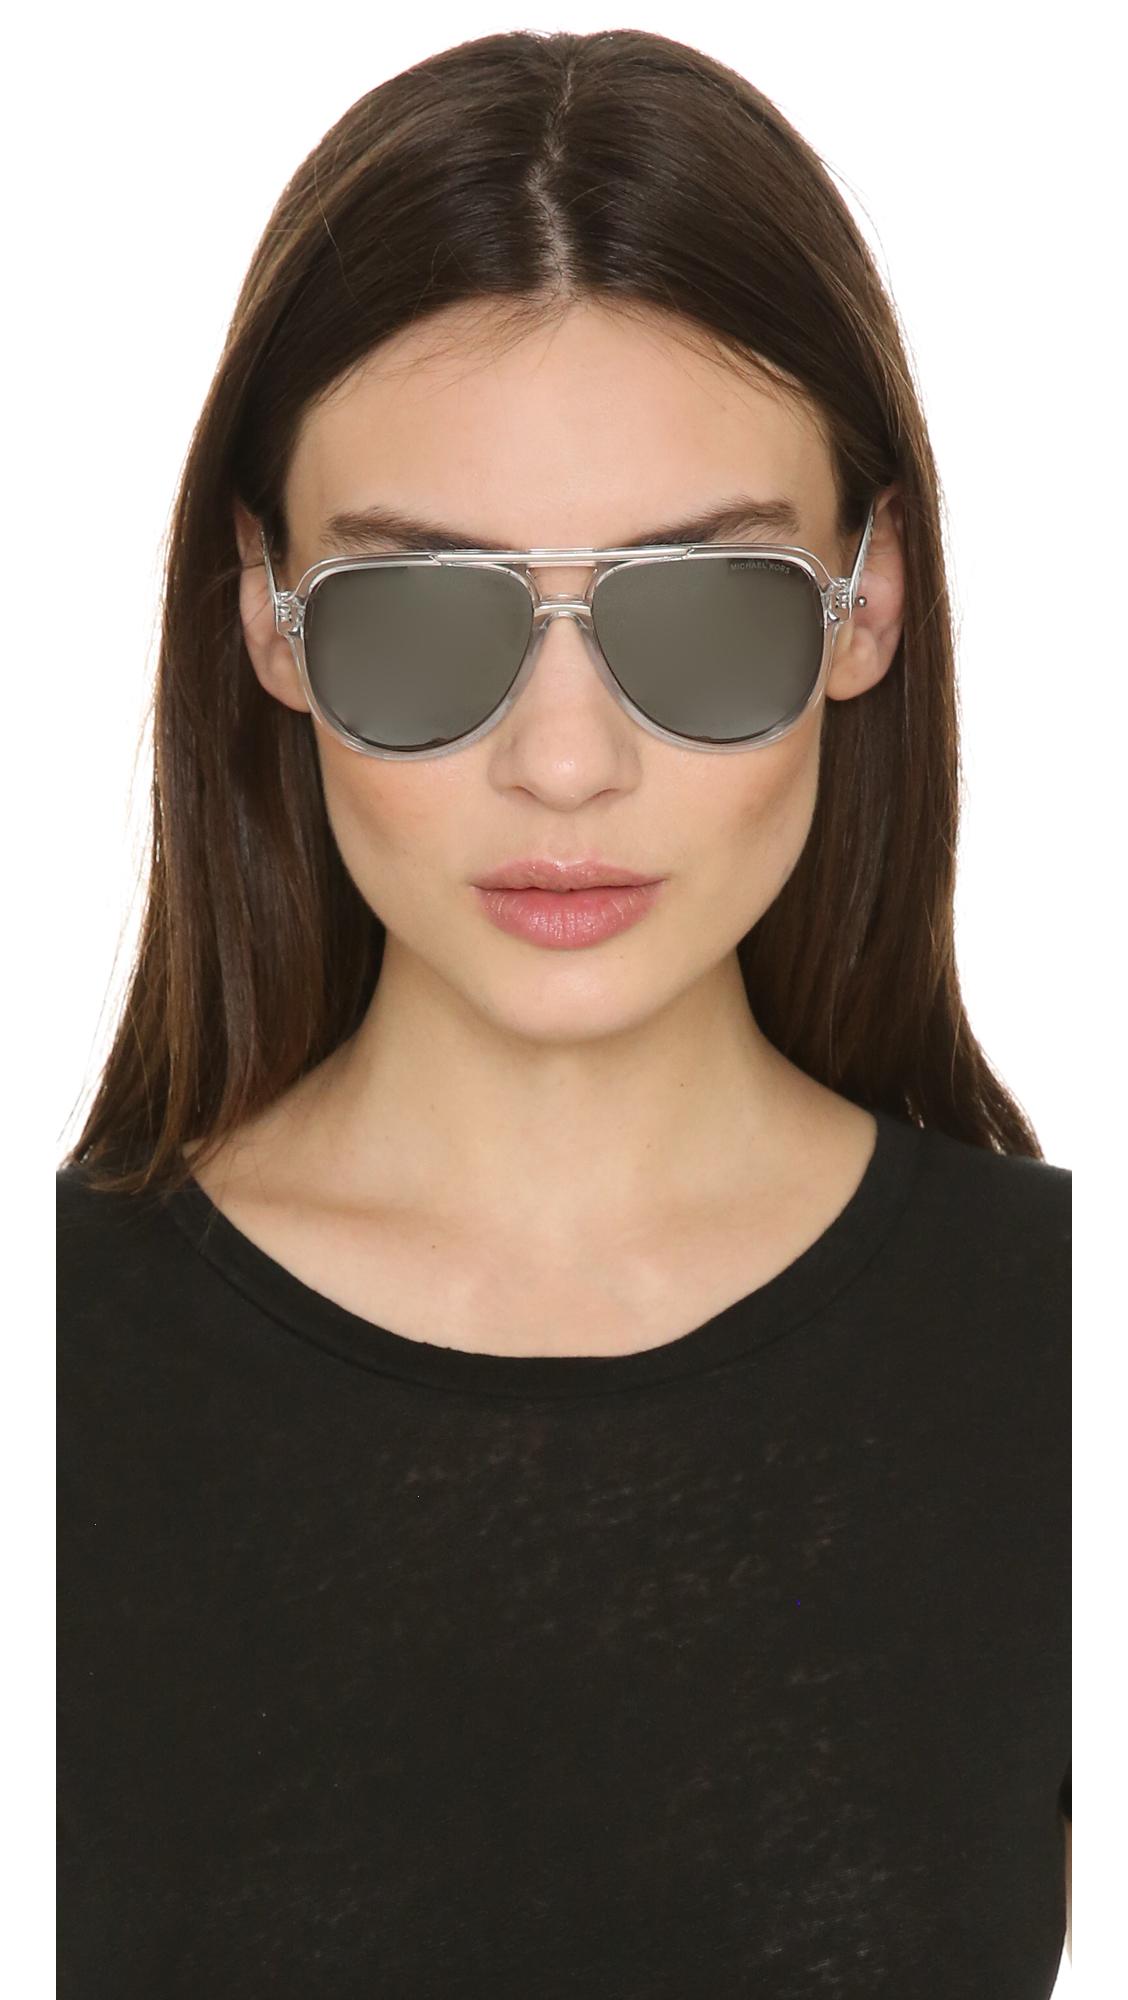 0382bac1cc63 Michael Kors Clementine Sunglasses in Metallic - Lyst